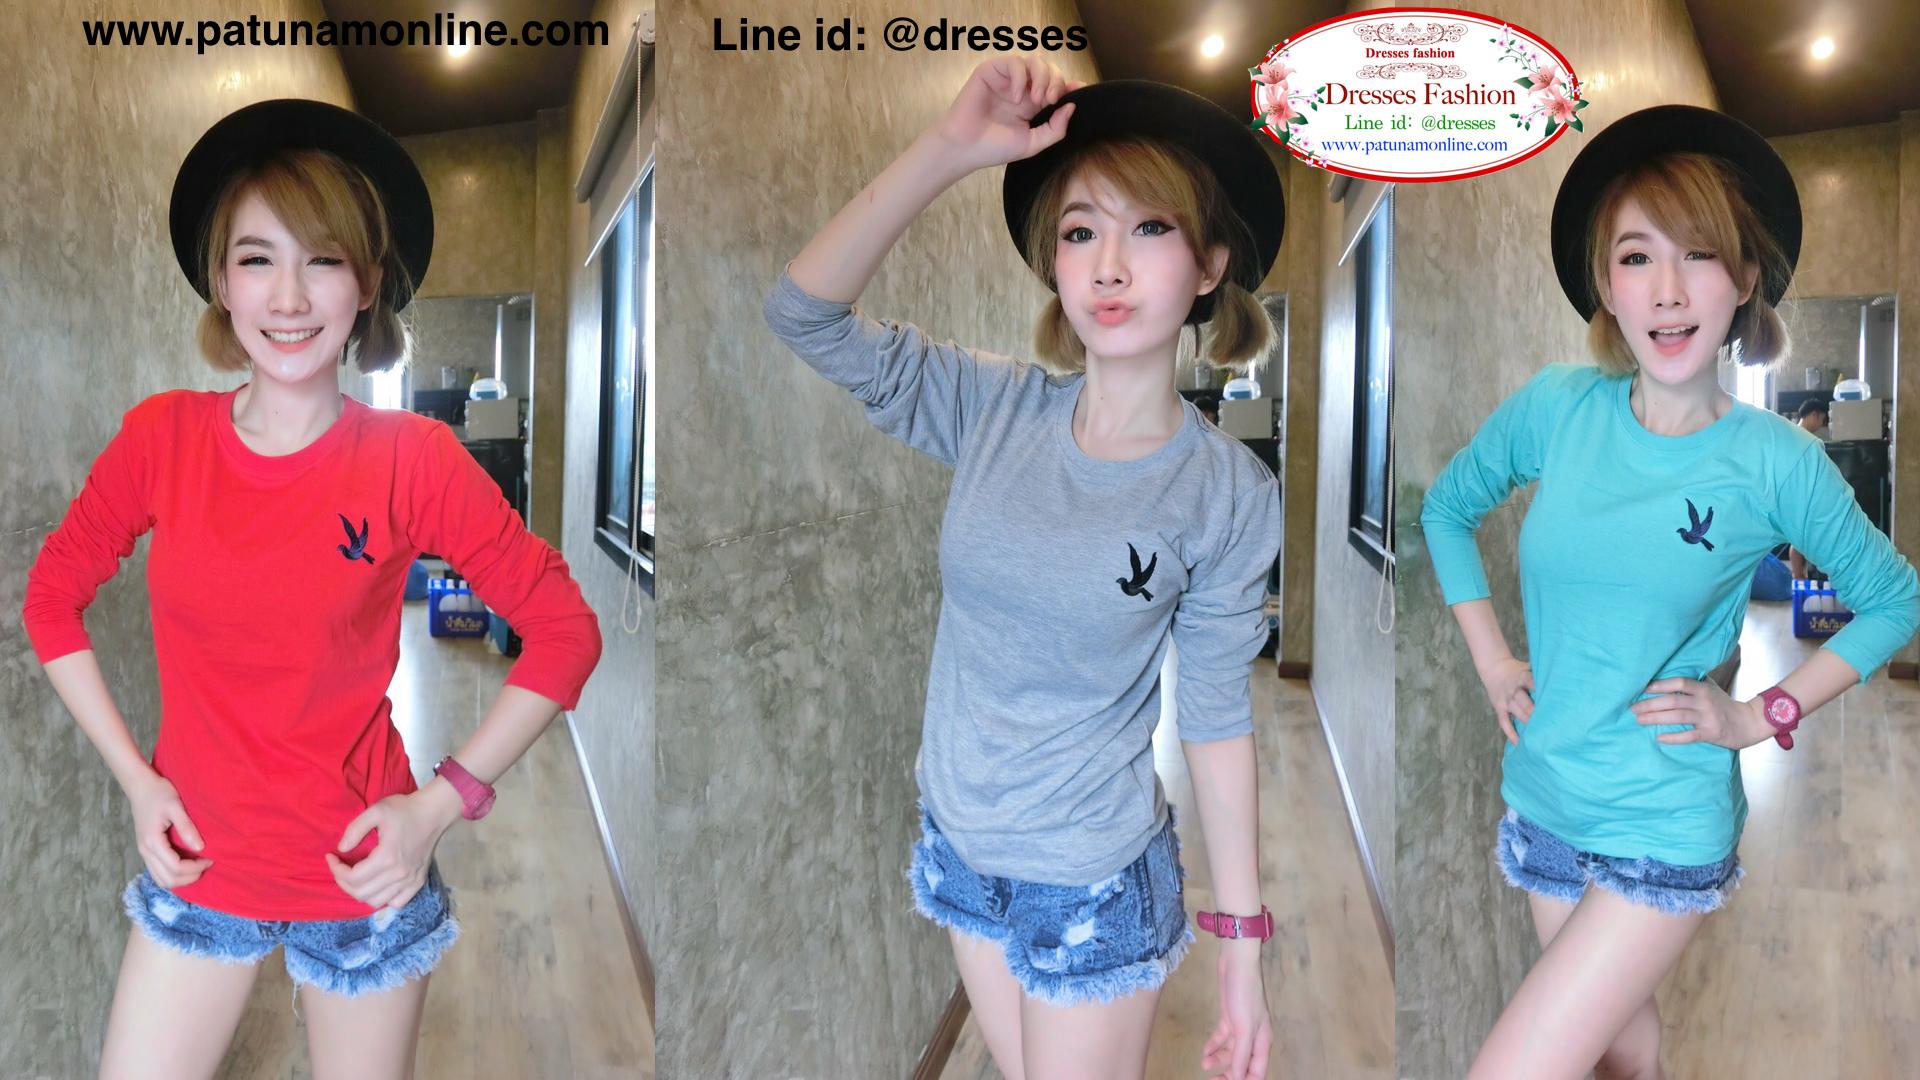 เสื้อยืดแฟชั่นผู้หญิง เสื้อยืดแฟชั่นเกาหลี.009